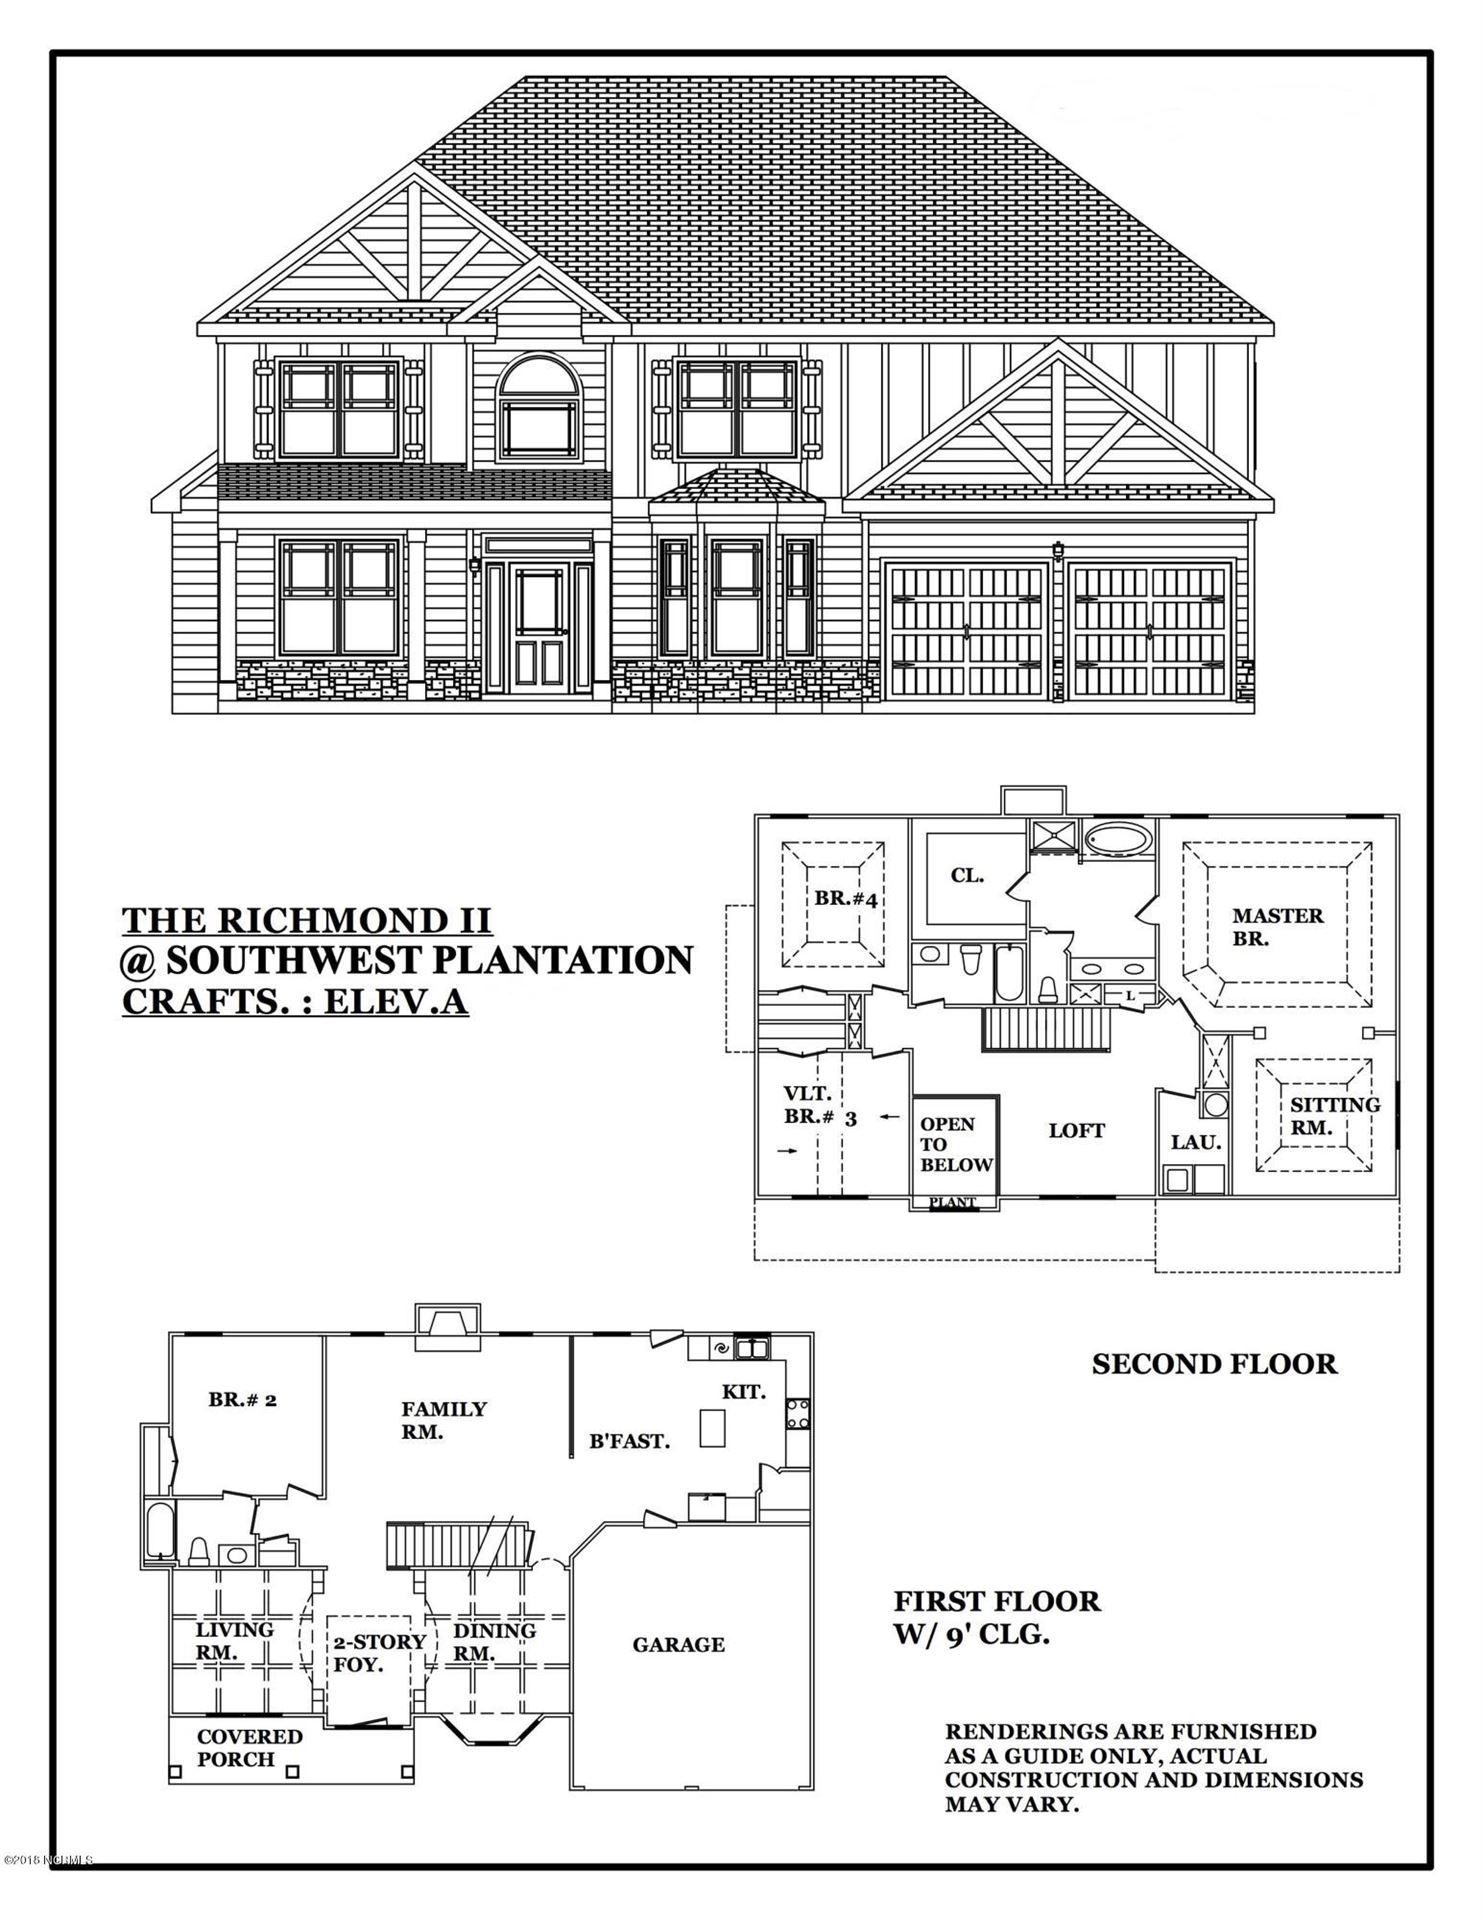 309 Southwest Plantation Drive, Jacksonville, NC Single ... on south west climate, south west contemporary style homes, south west home plans, south west architecture,